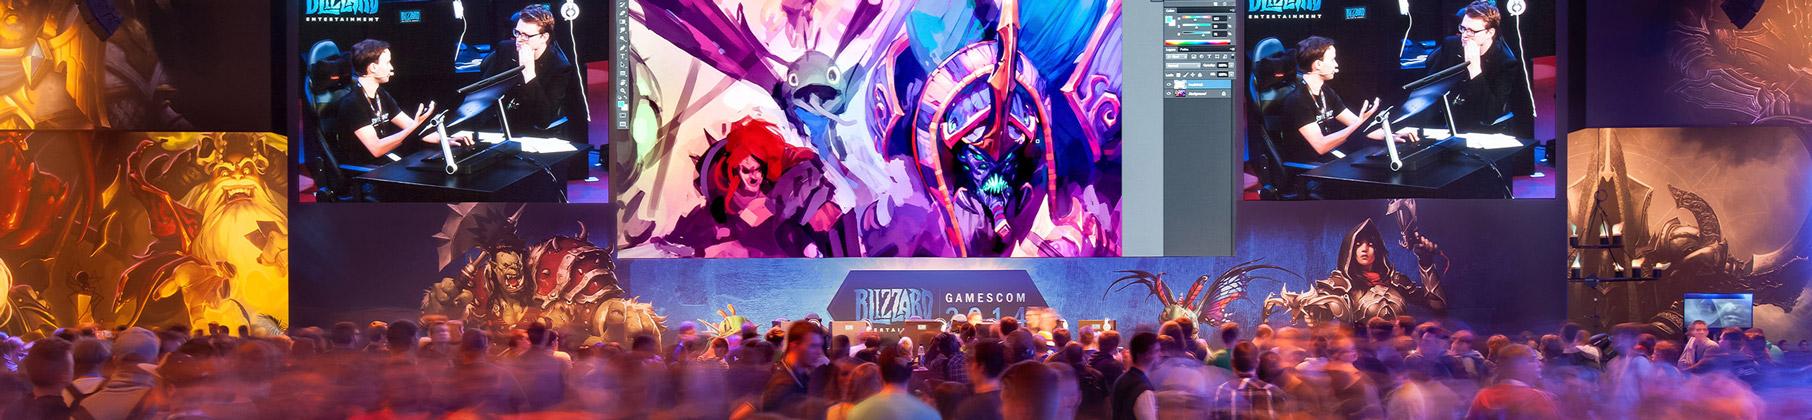 LED Wand mieten, gamescom 2014, activision